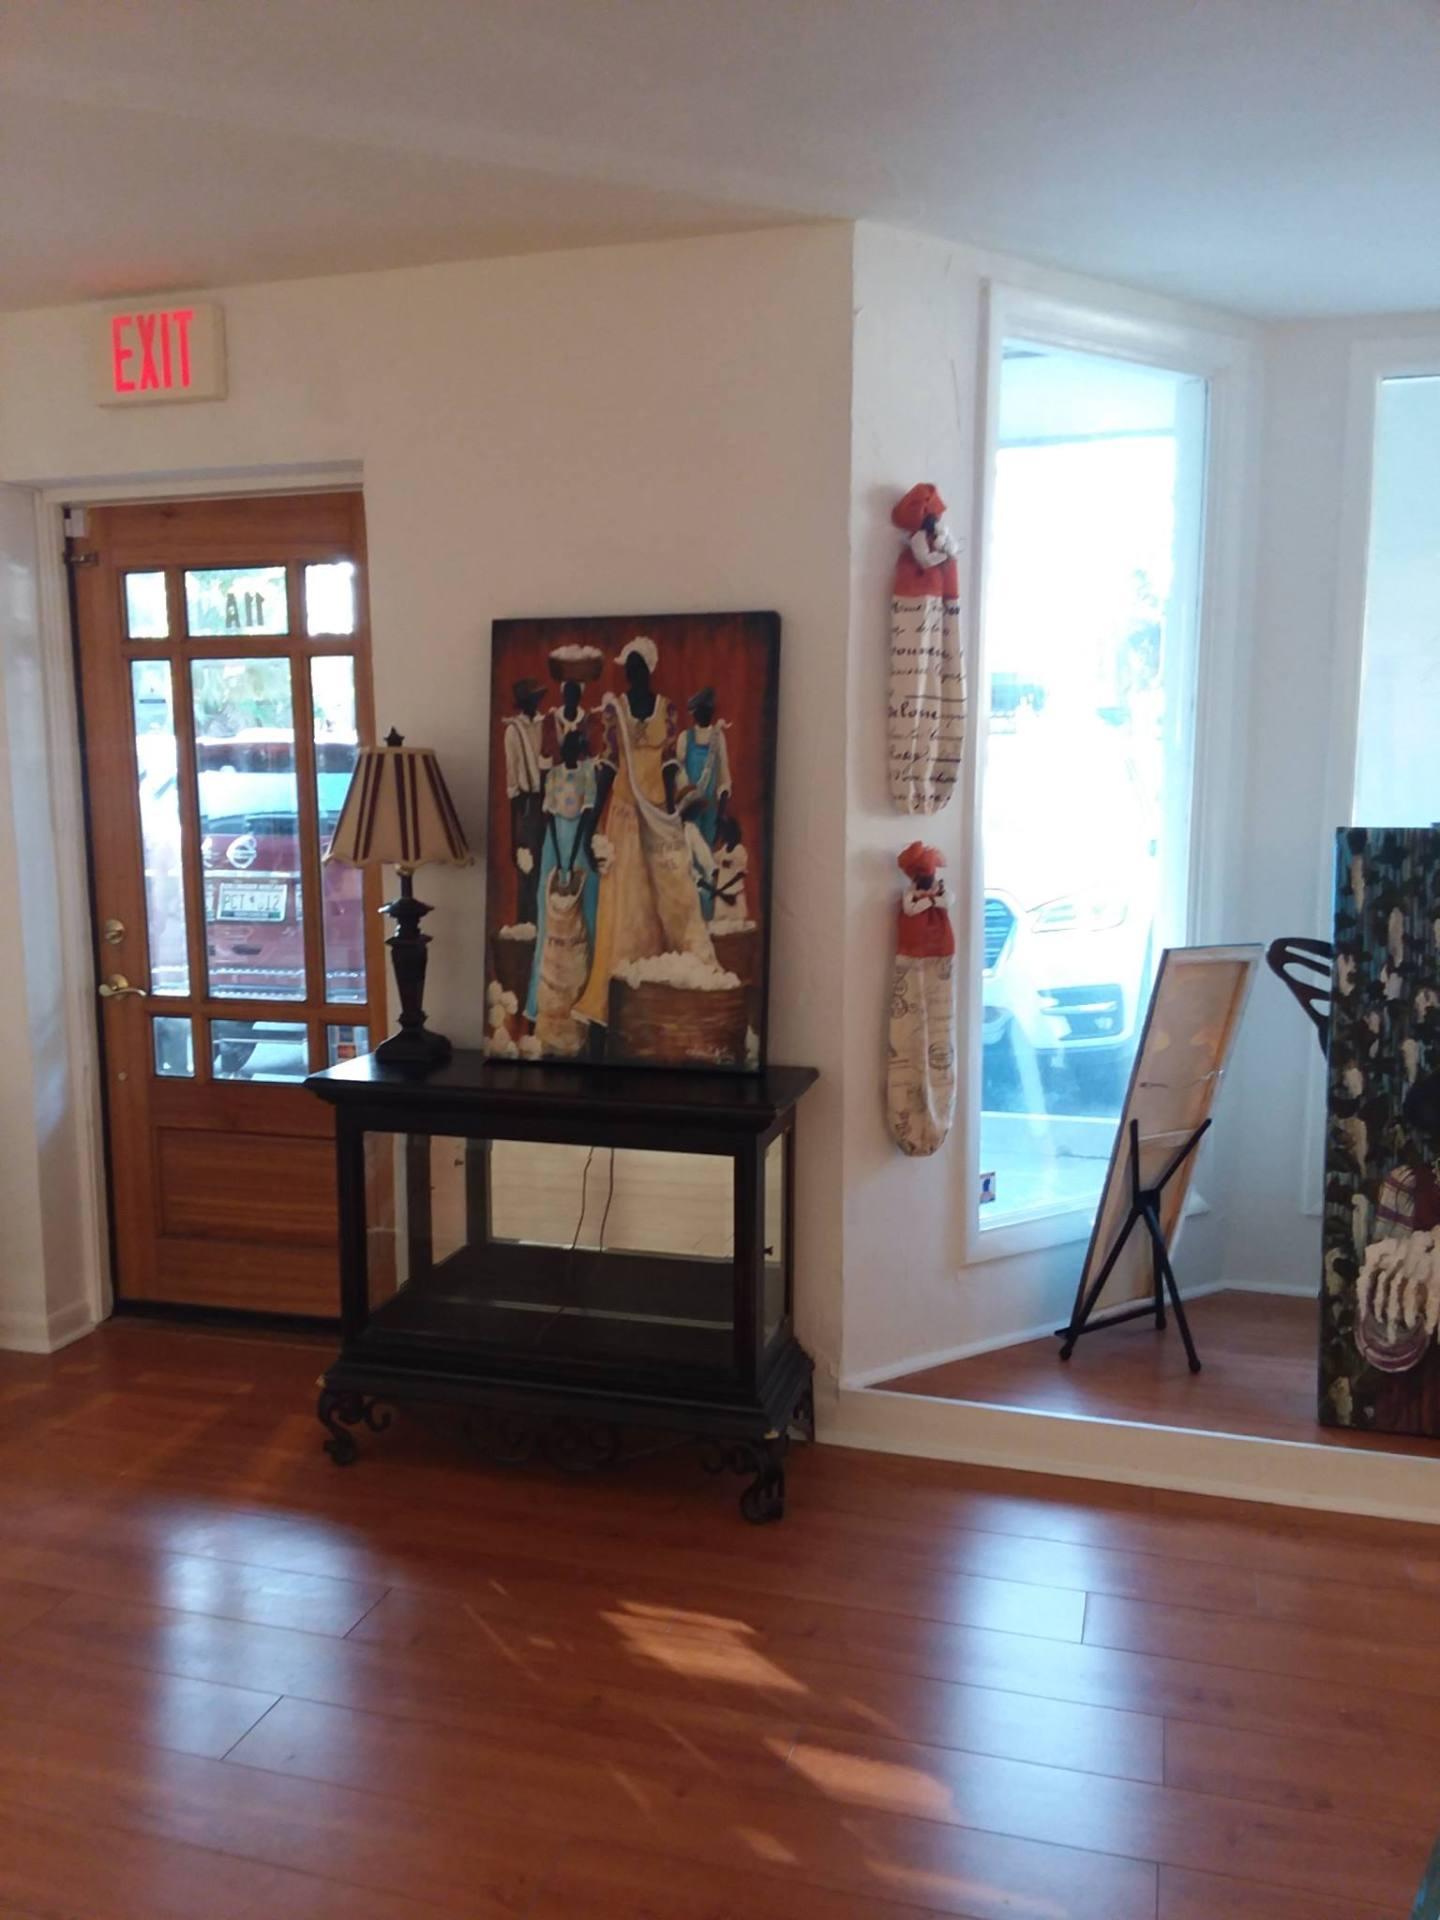 57541759_10215841314520637_1502024031337971712_o-1-1440x1920 International Cultural Gullah Artist Sonja Griffin Evans Unveils Newest Art Studio